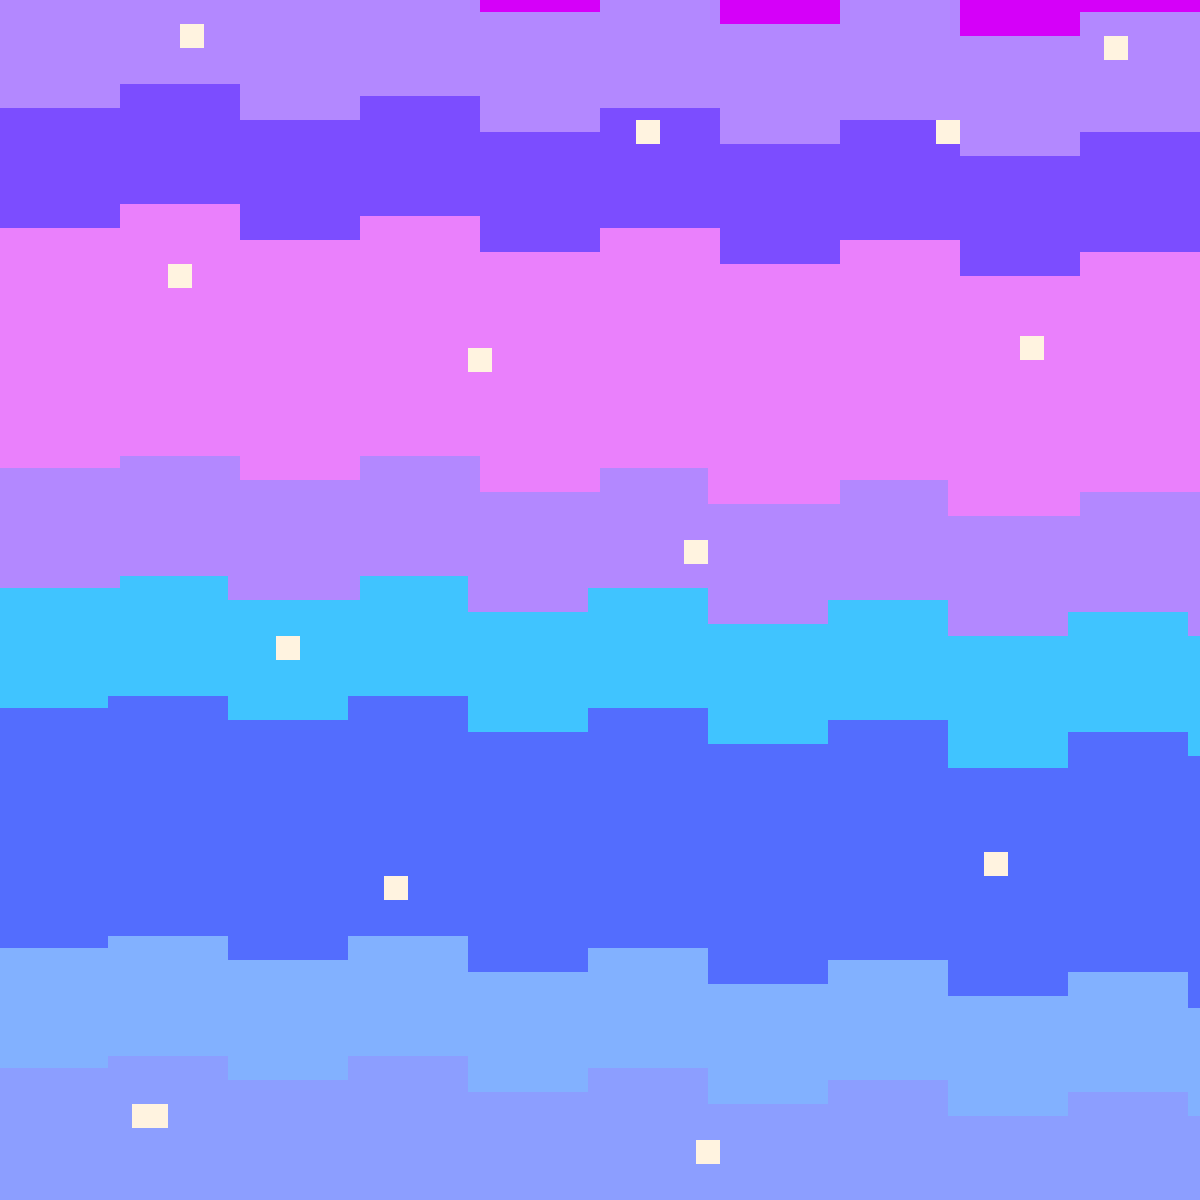 Starry Sky by Pixelartist9